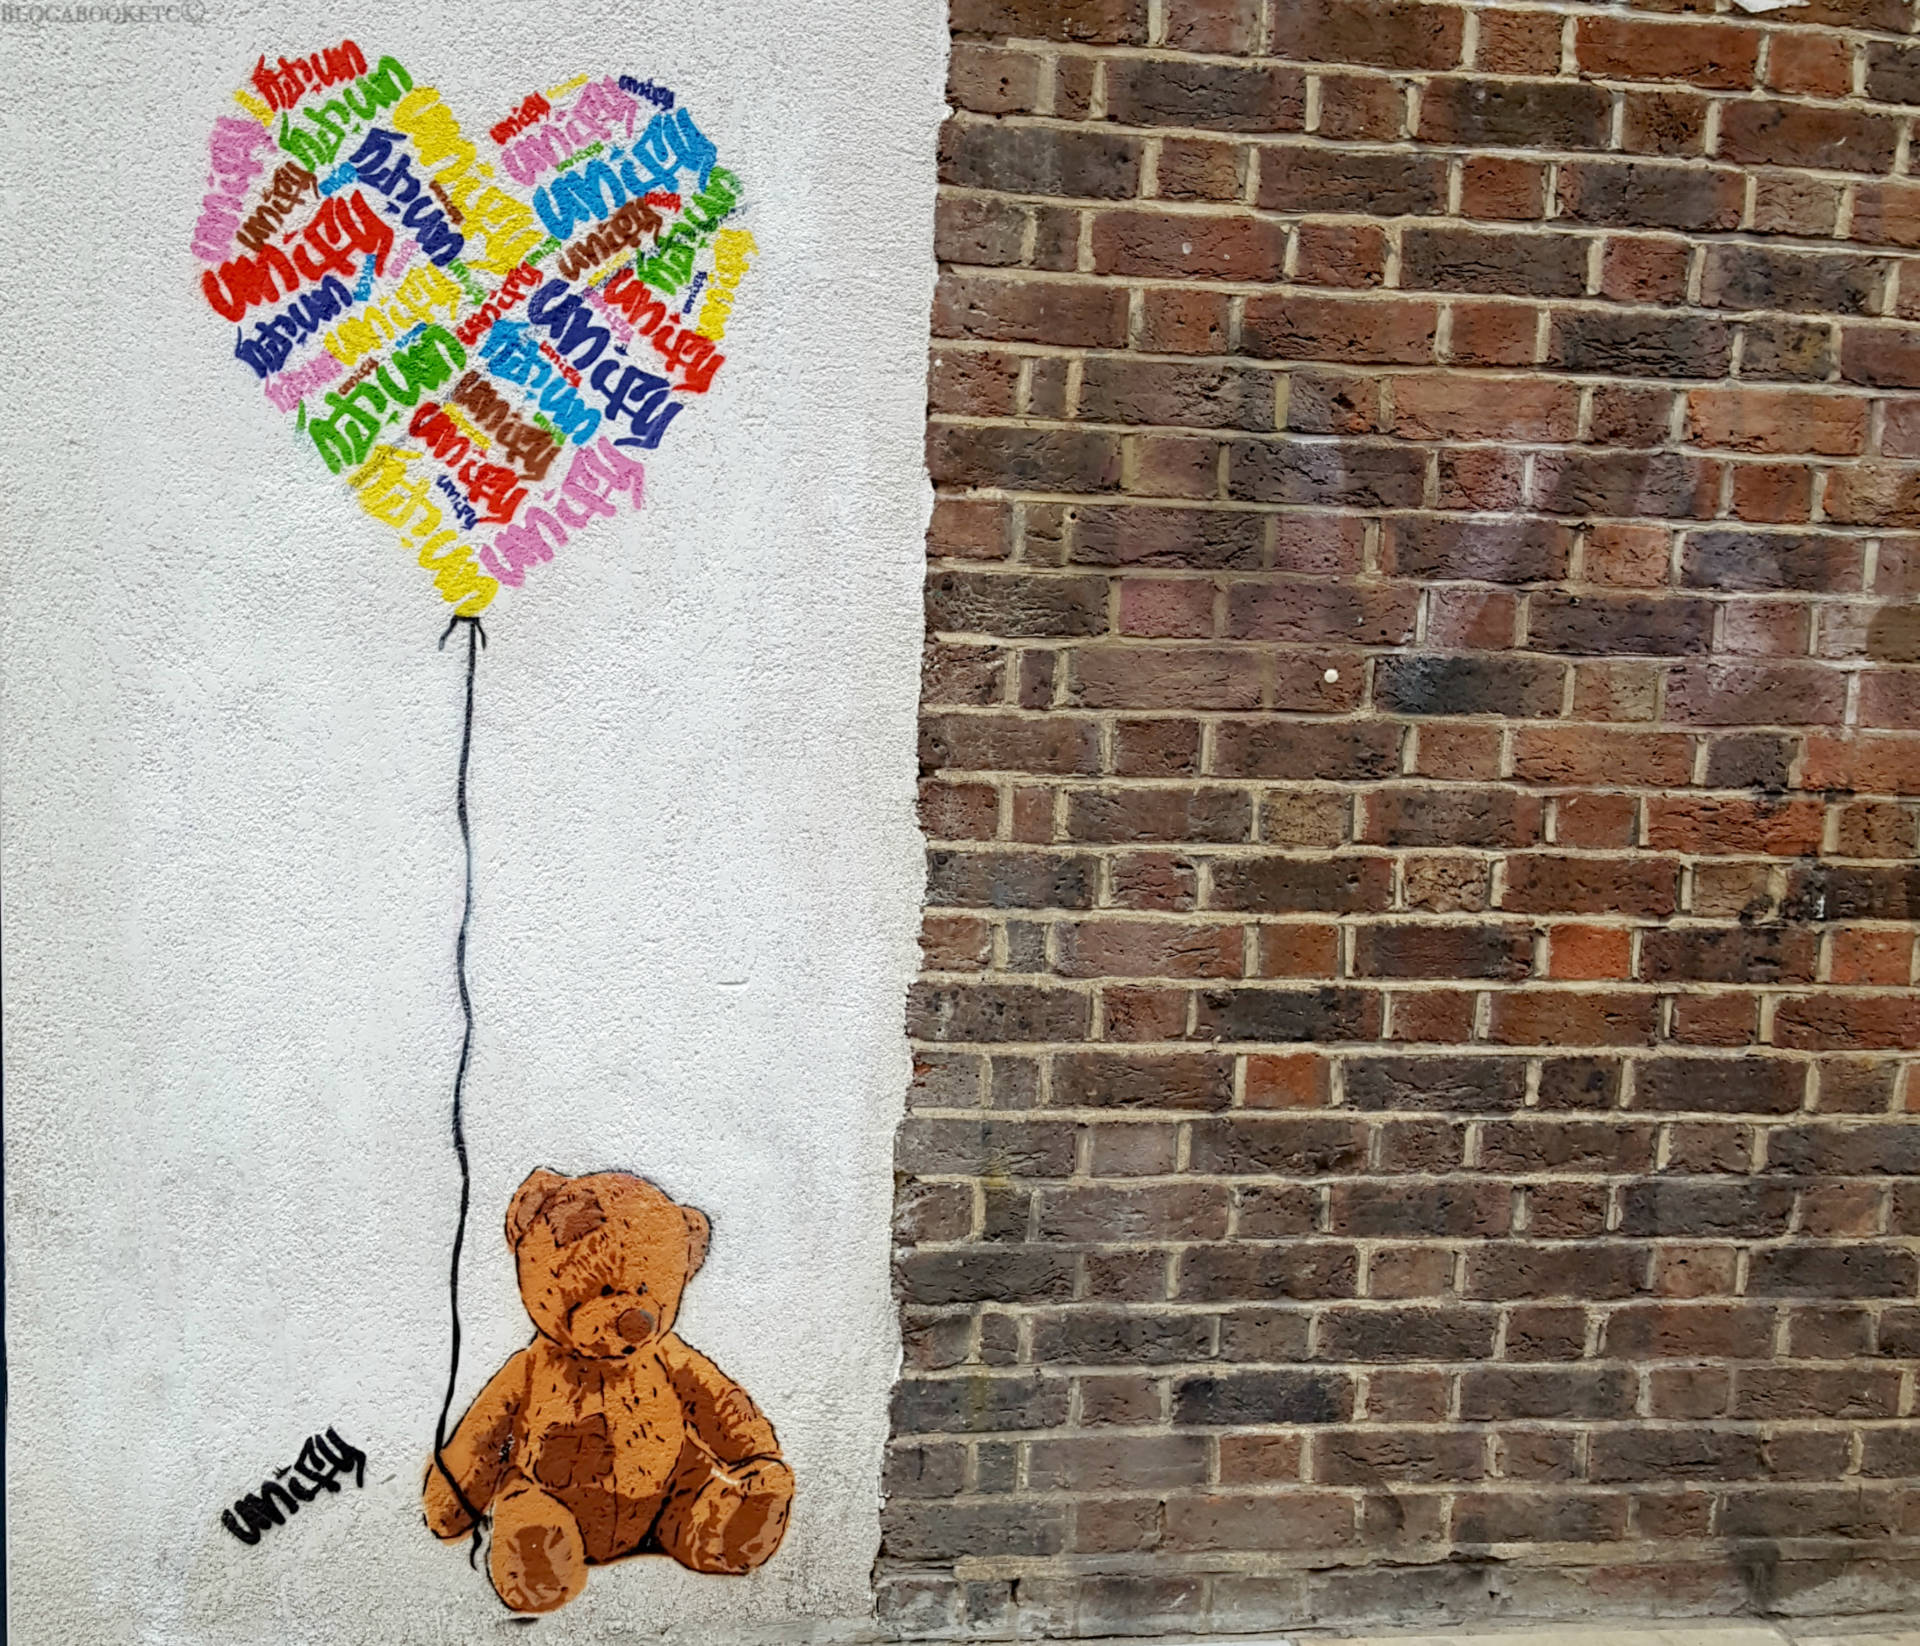 Nurse Life, Life, Nurse, Nursing, Intensive Care, Cardiac Nurse, Critical Care Nursing, Critical Care, London, Shoreditch, Redchurch Street, Graffiti, Street Art, Blog A Book Etc, Fay